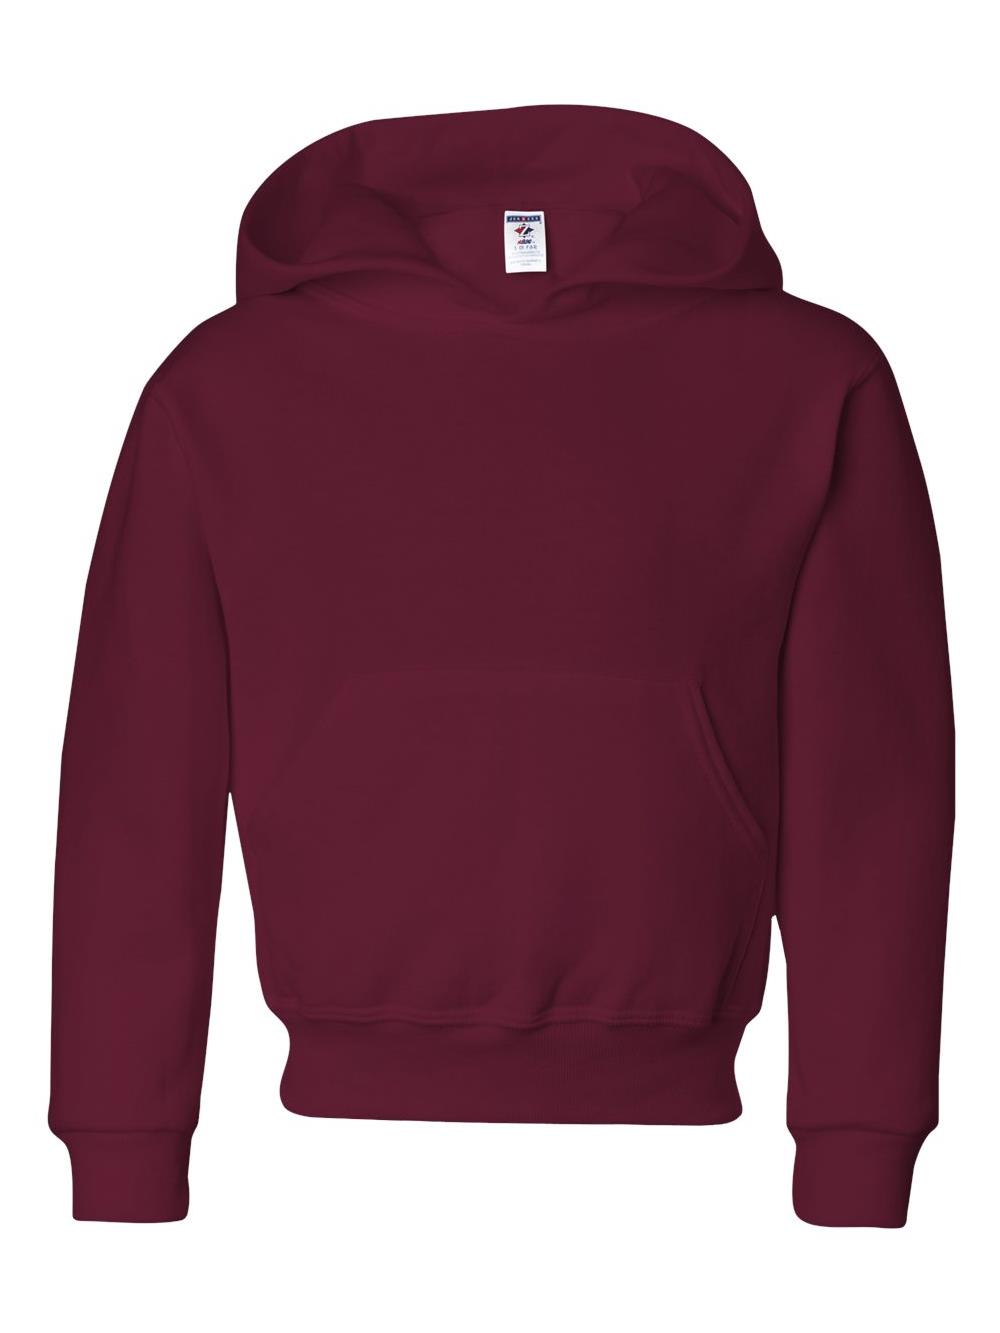 996YR Jerzees Fleece NuBlend Youth Hooded Sweatshirt